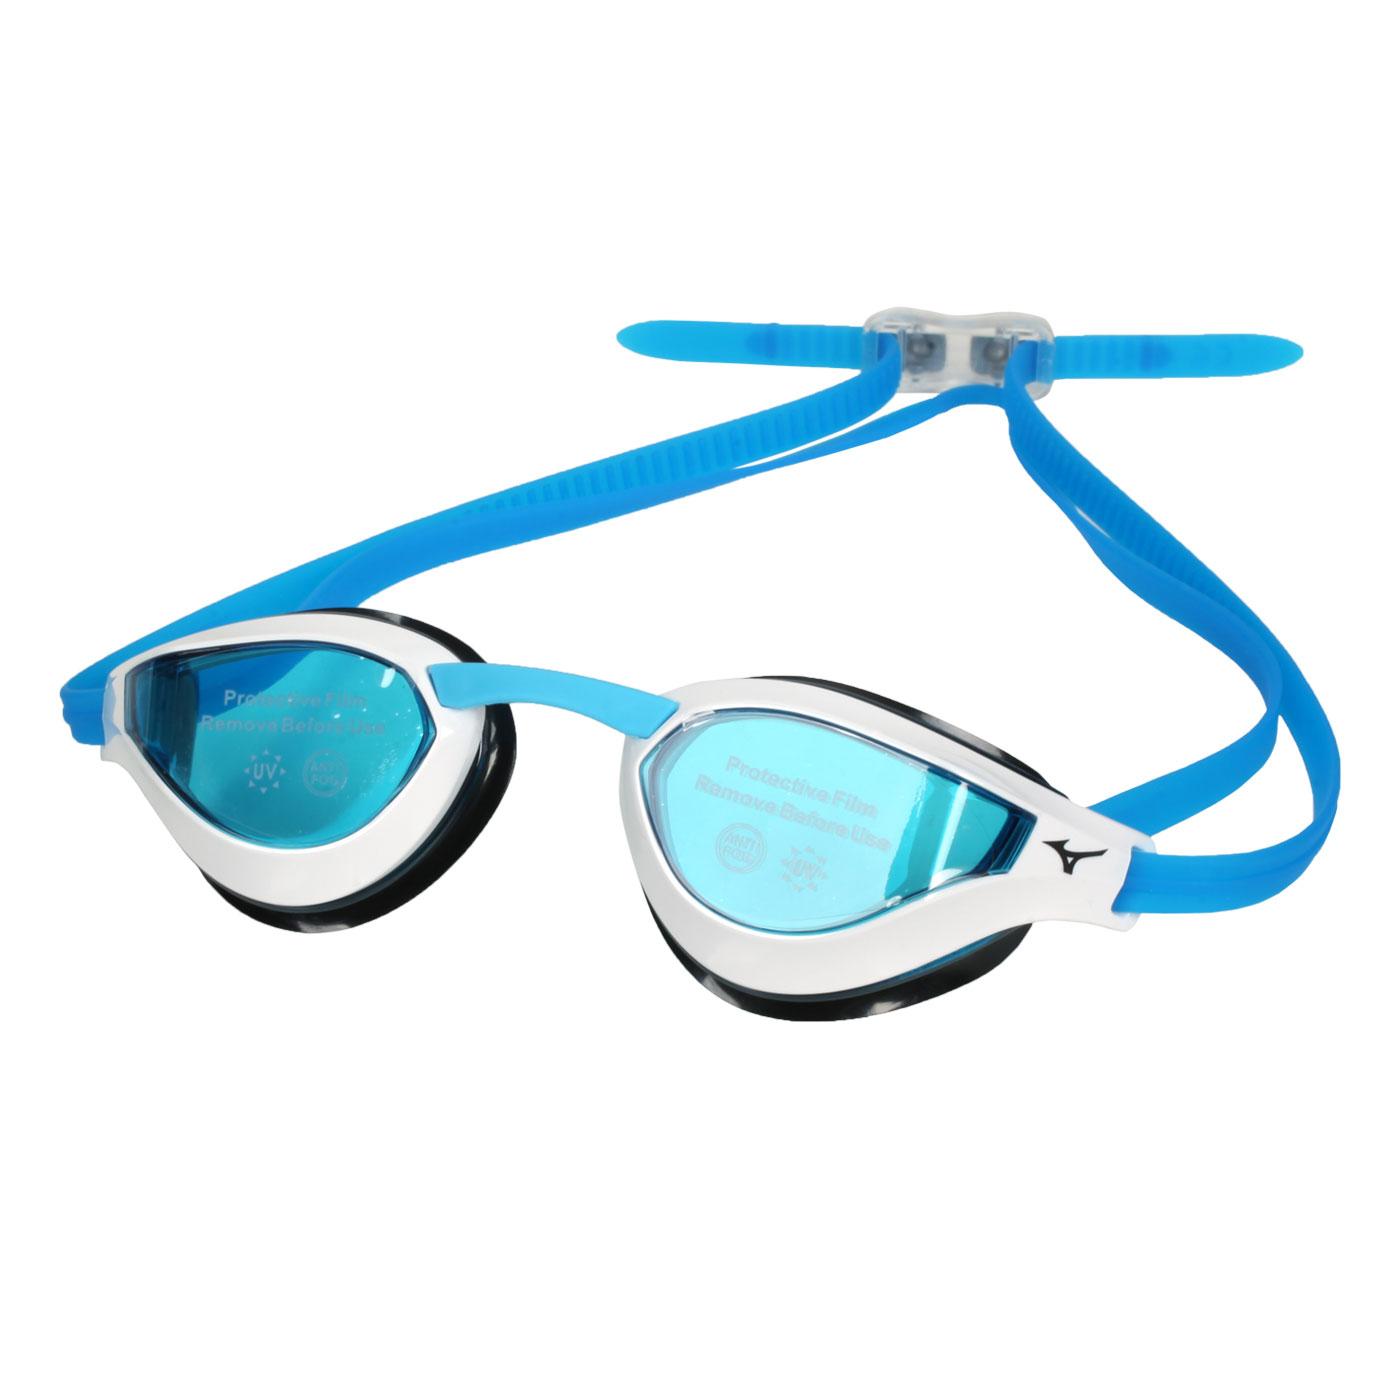 MIZUNO 泳鏡  SWIMN3TE951000-02 - 黑白藍